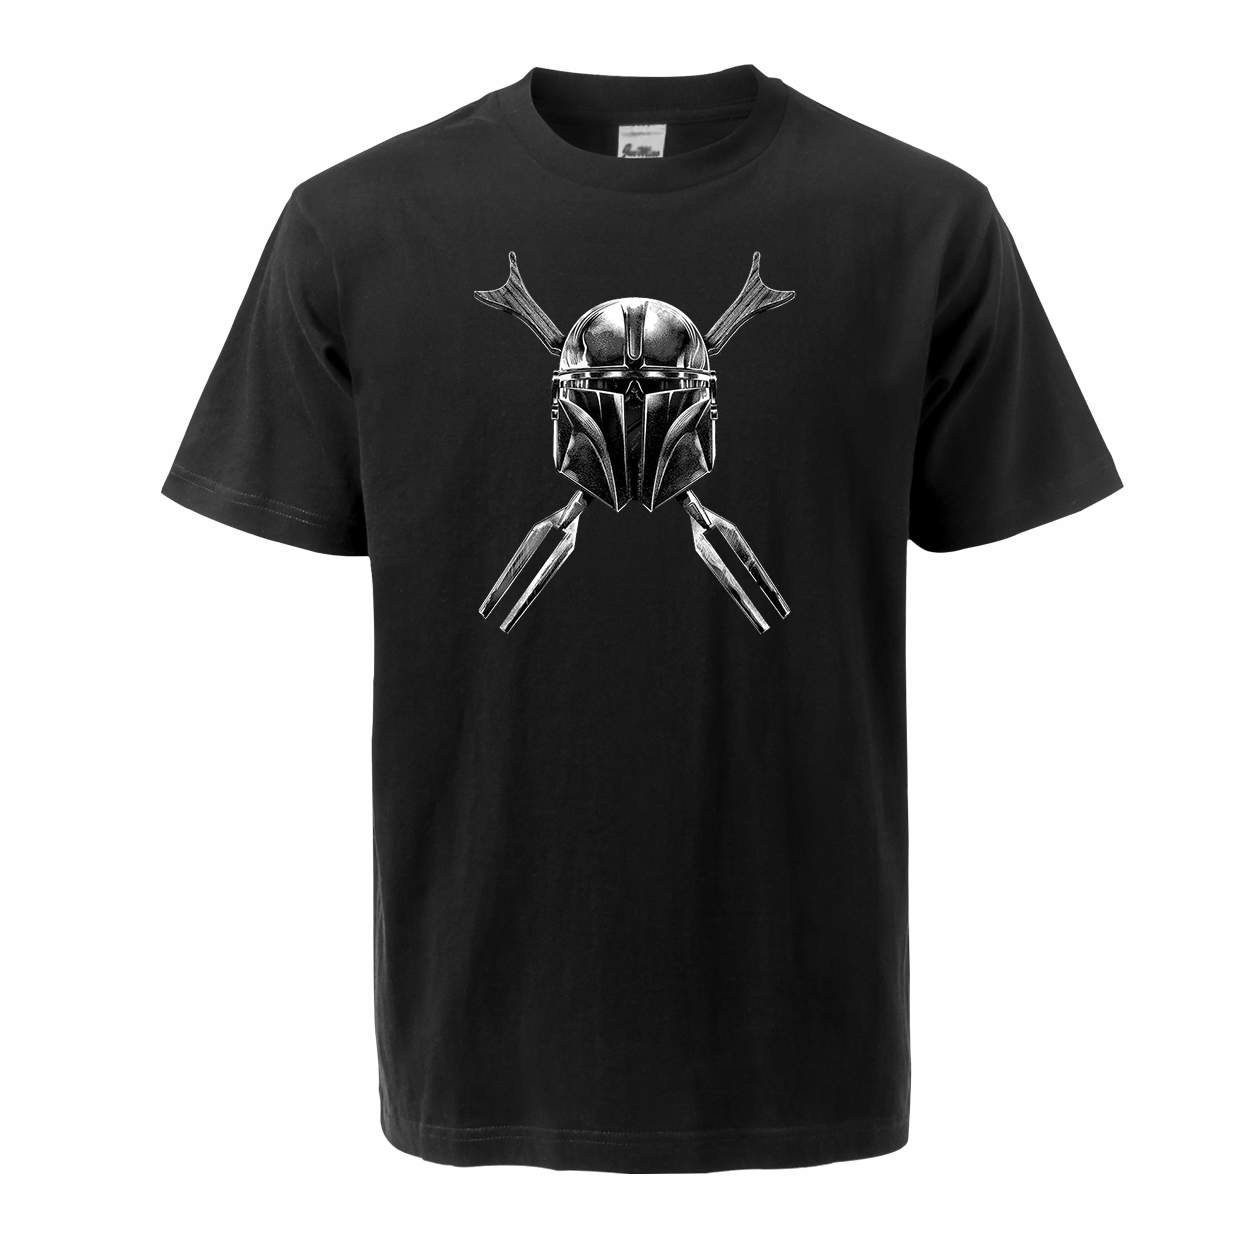 The Mandalorian Star Wars Men T Shirts 2020 Summer Tops Tees 100% Cotton Short Sleeve Bounty Skull Streetwear Crew Neck T-shirts